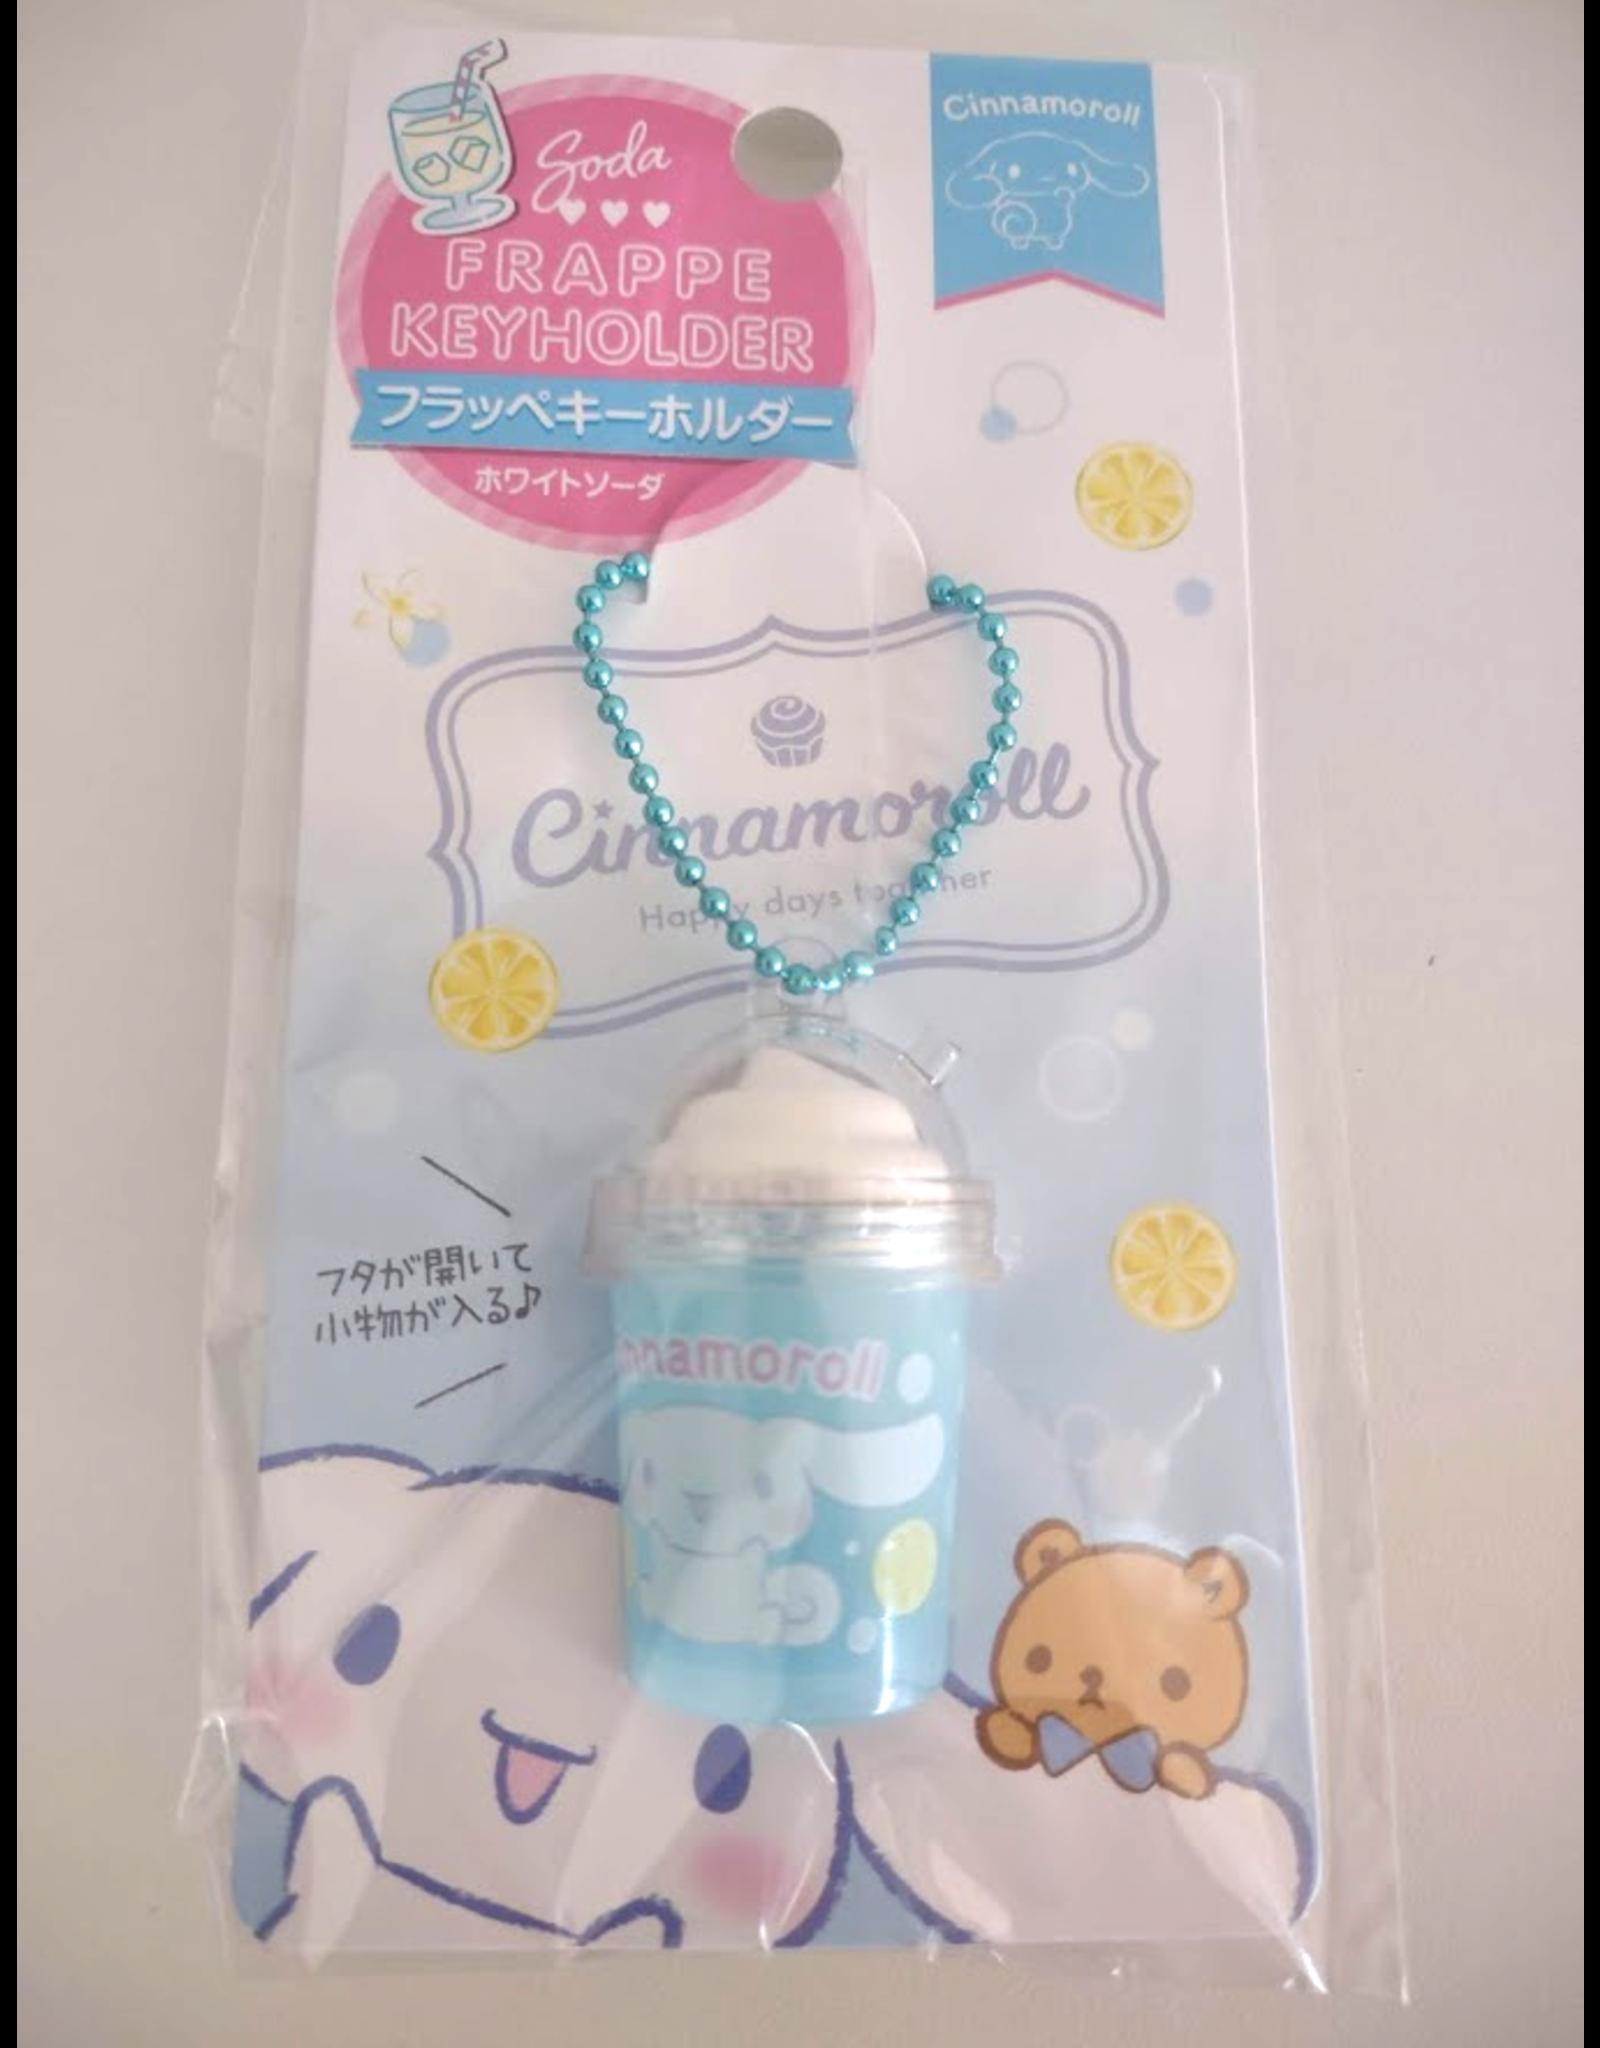 Sanrio Frappe Keyholder - Cinnamoroll Soda